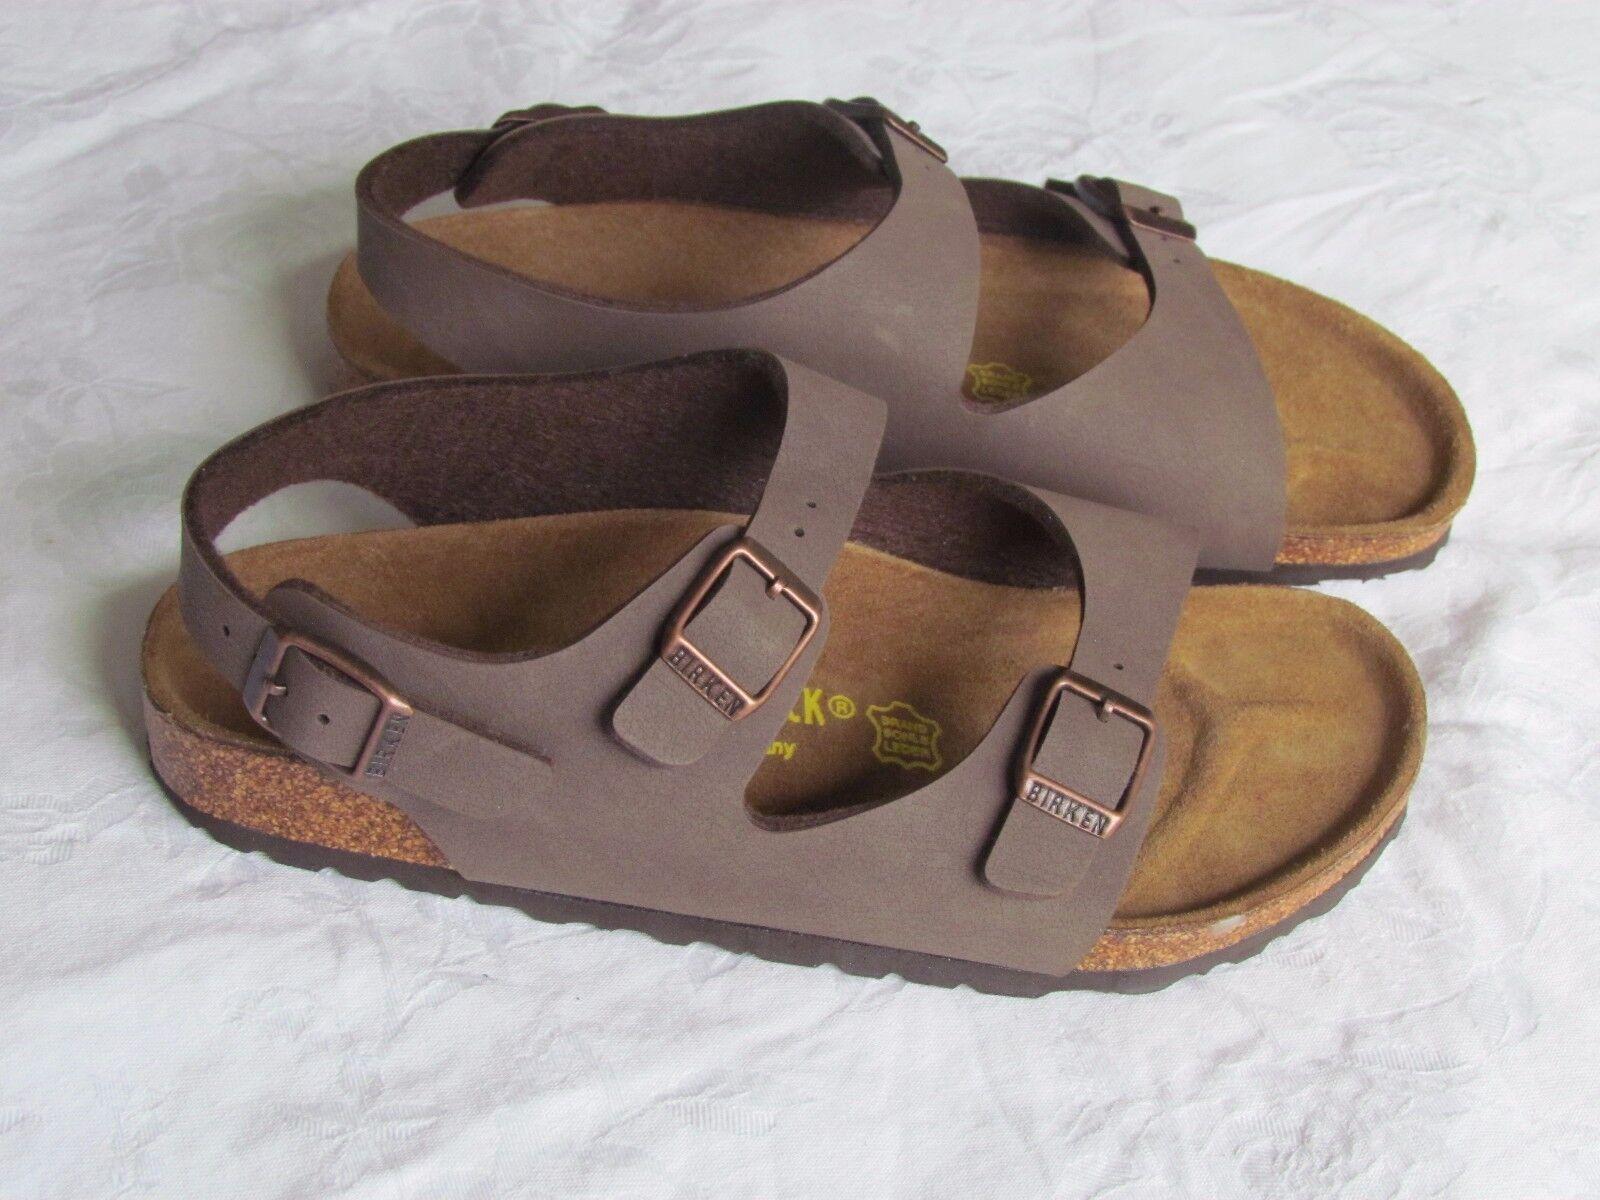 Nuevo Birkenstock Damas Chicos Chicas Mocca Marrón Mulas Sandalias UK Size 2